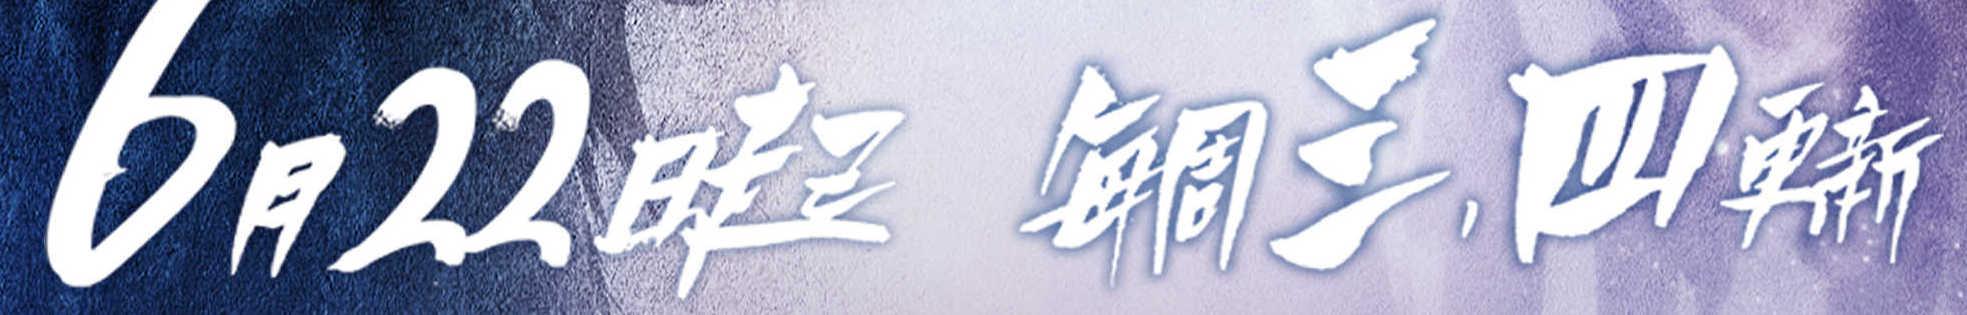 黑白星球官方账号 banner